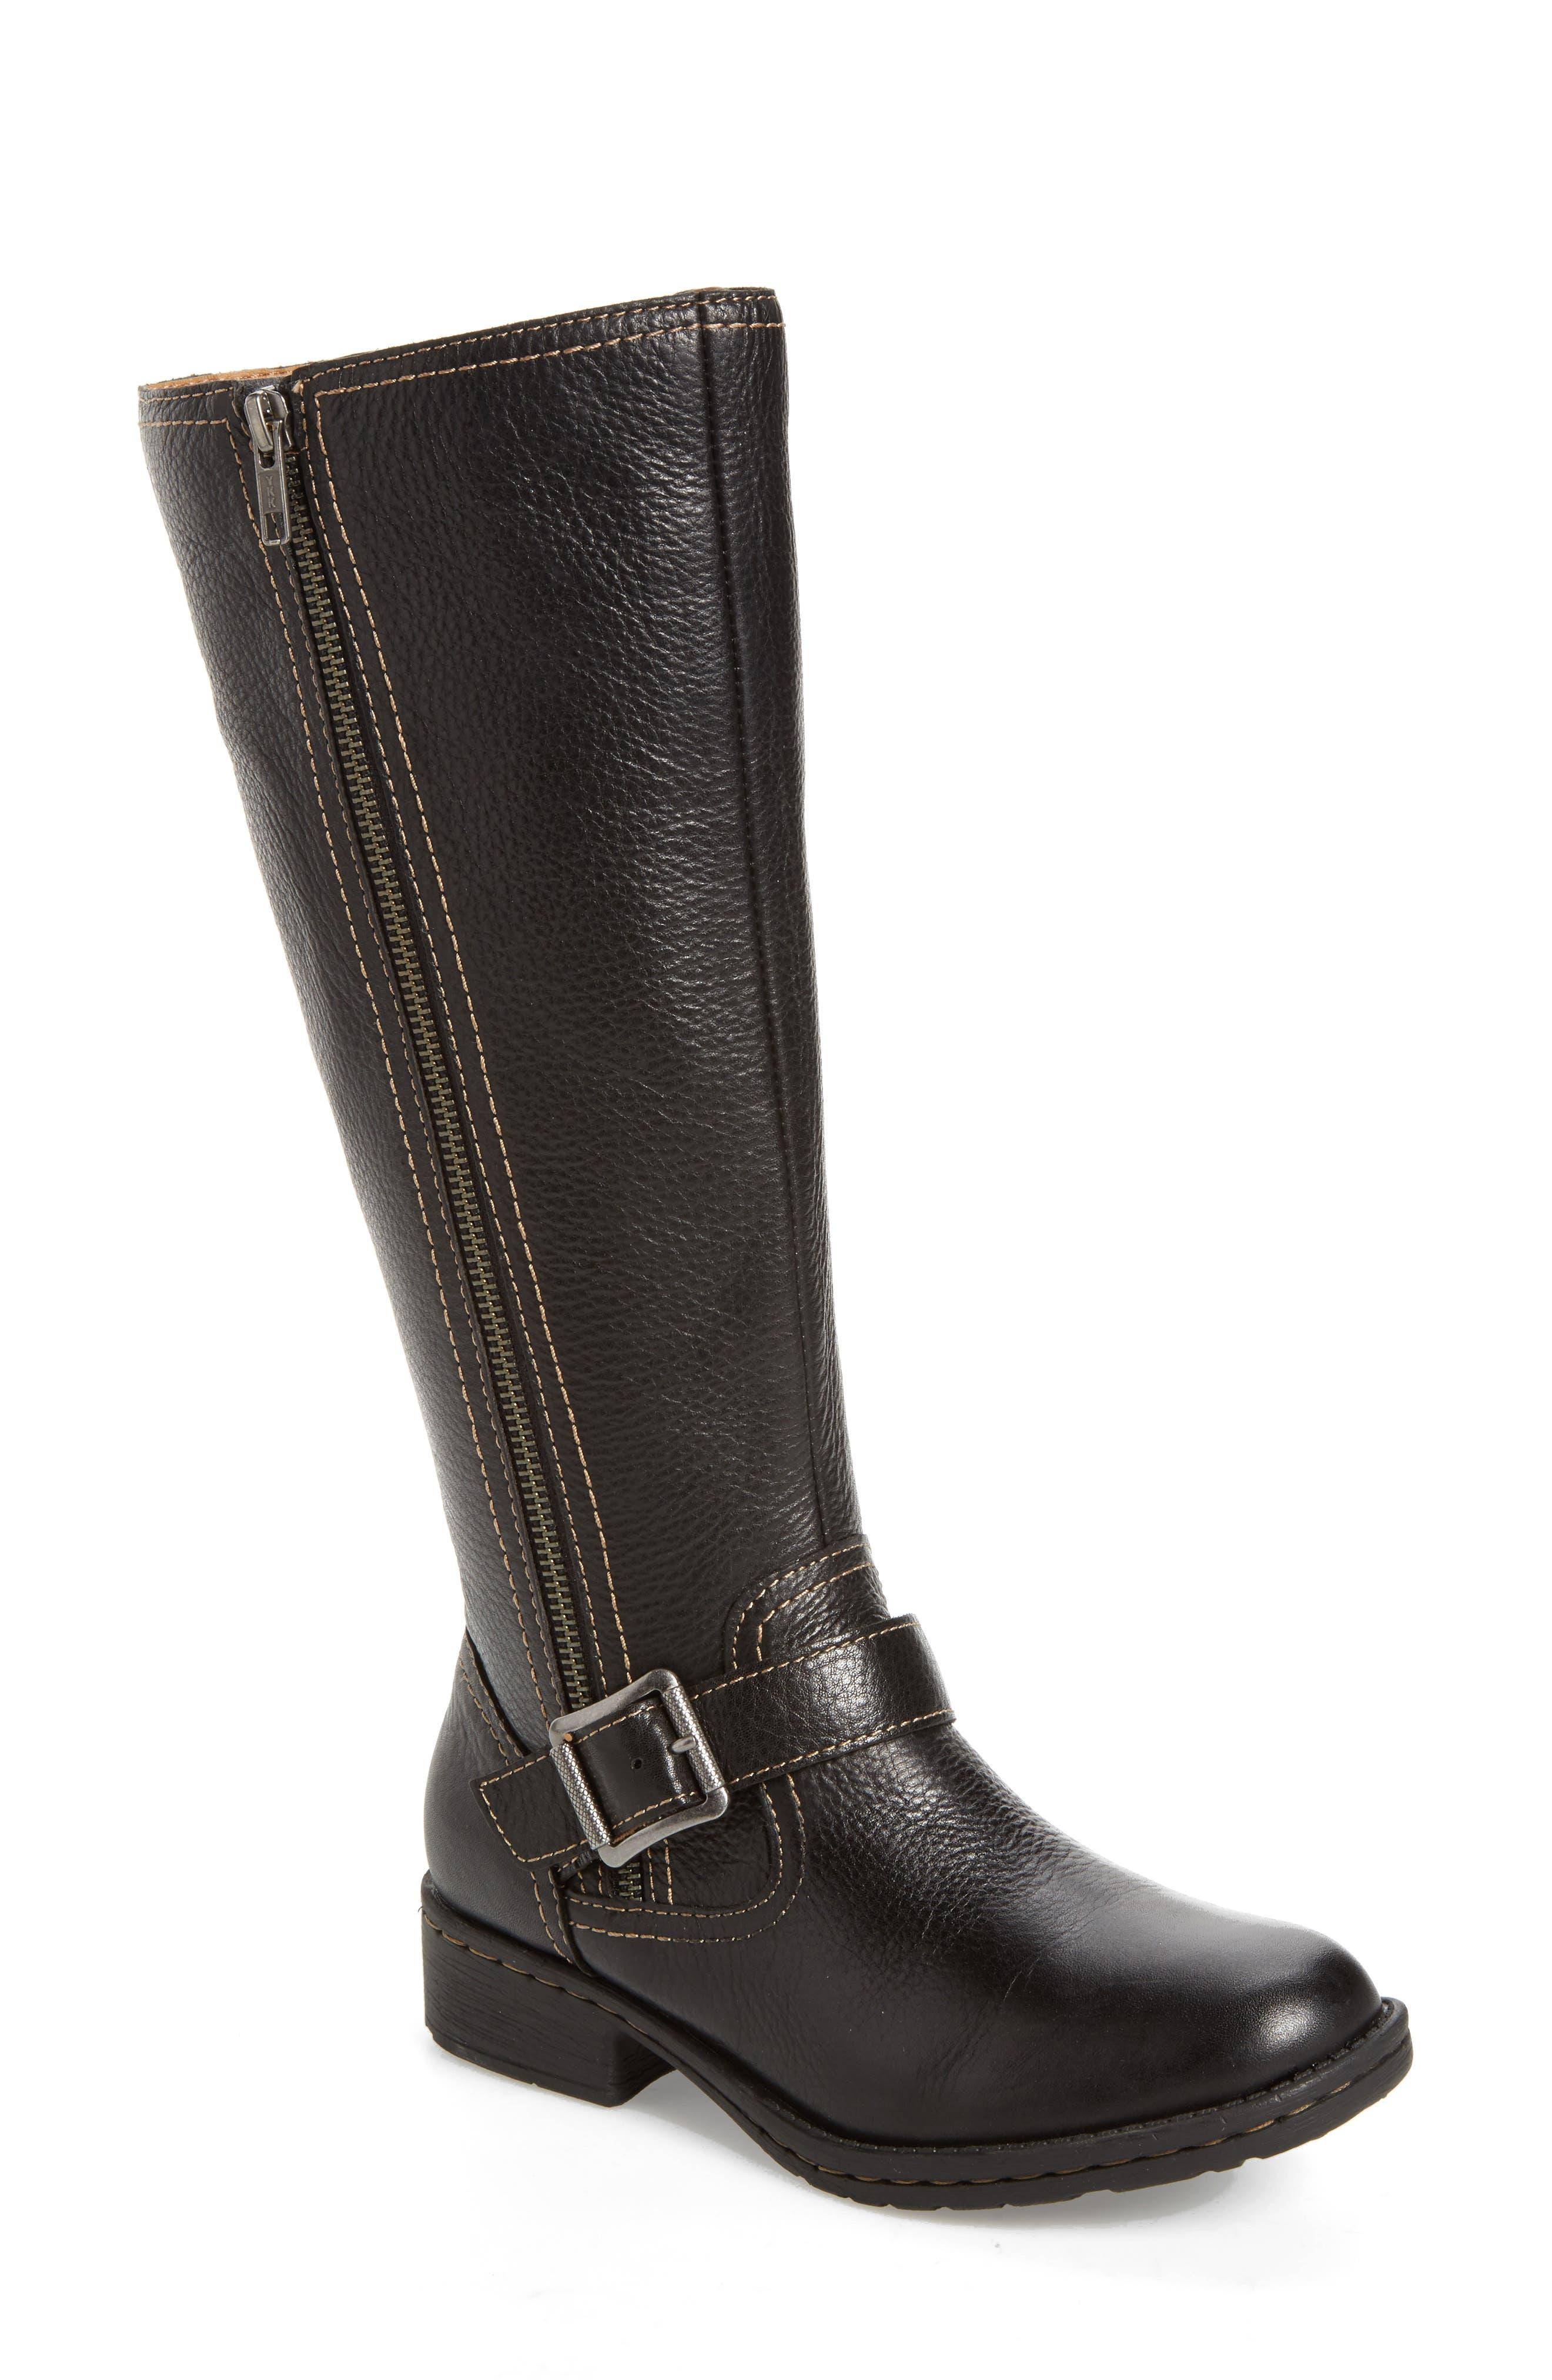 Alternate Image 1 Selected - Comfortiva Sedalia Tall Boot (Women)